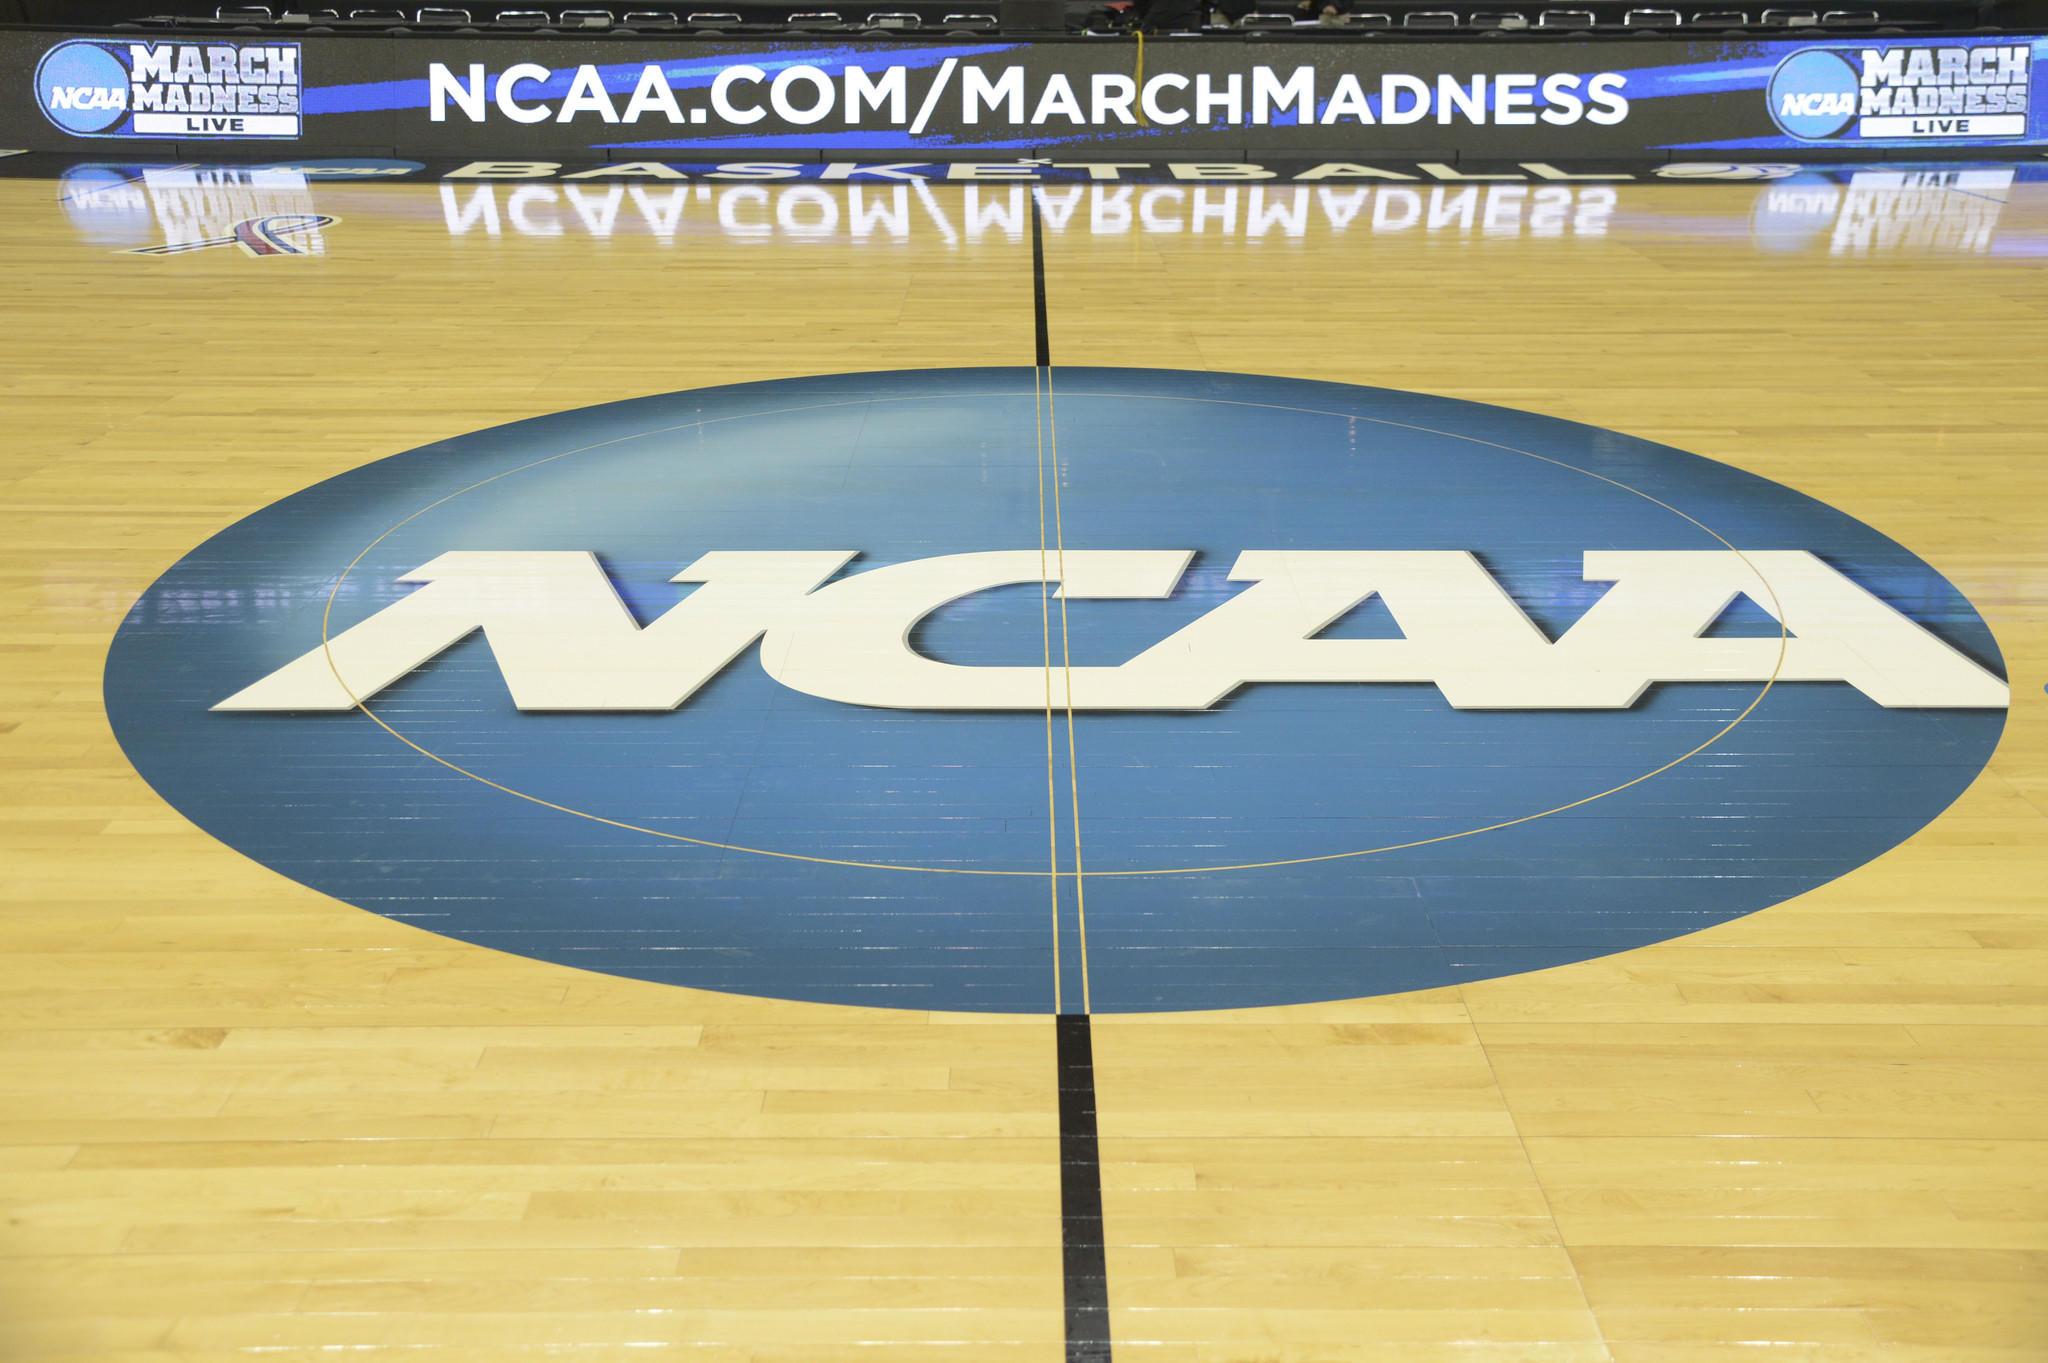 The NCAA men's basketball tournament began this week.